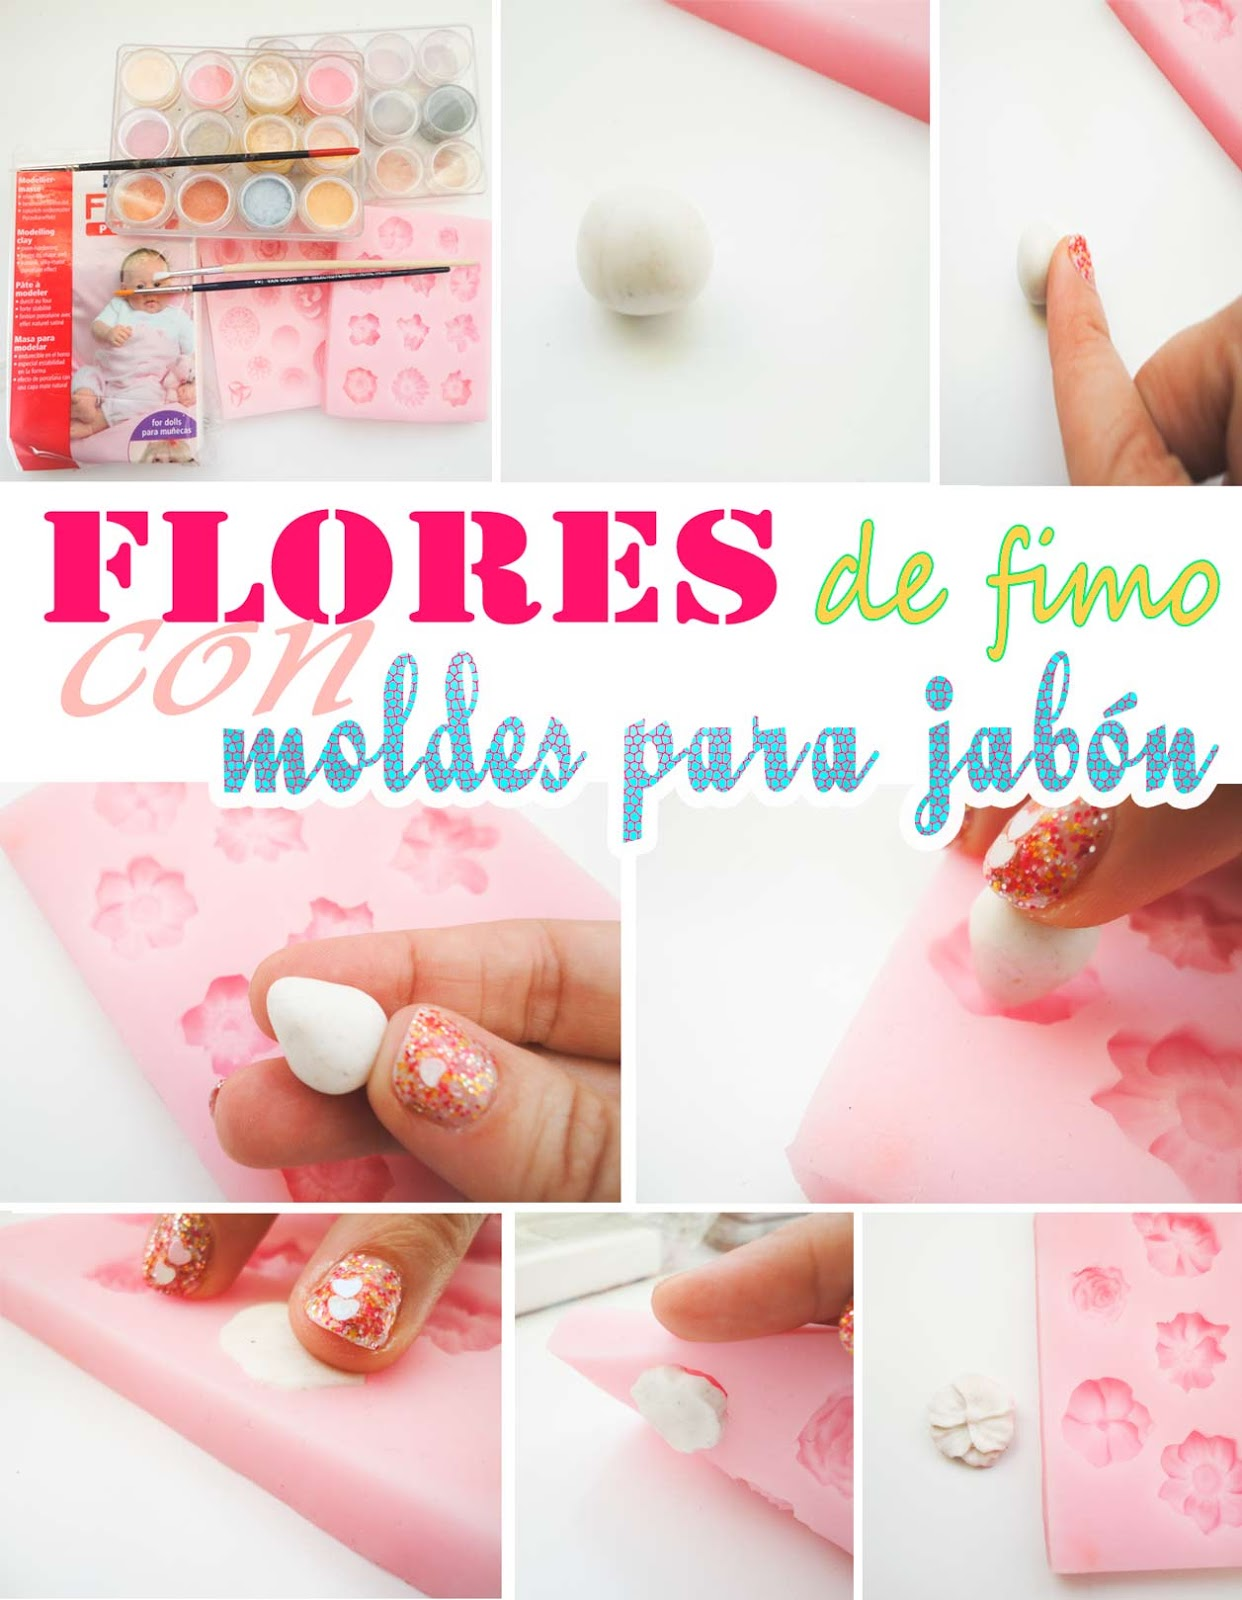 como-hacer-flores-de-fimo-con-moldes-de-jabon-how-to-make-flowers-polymer-clay-soap-molds